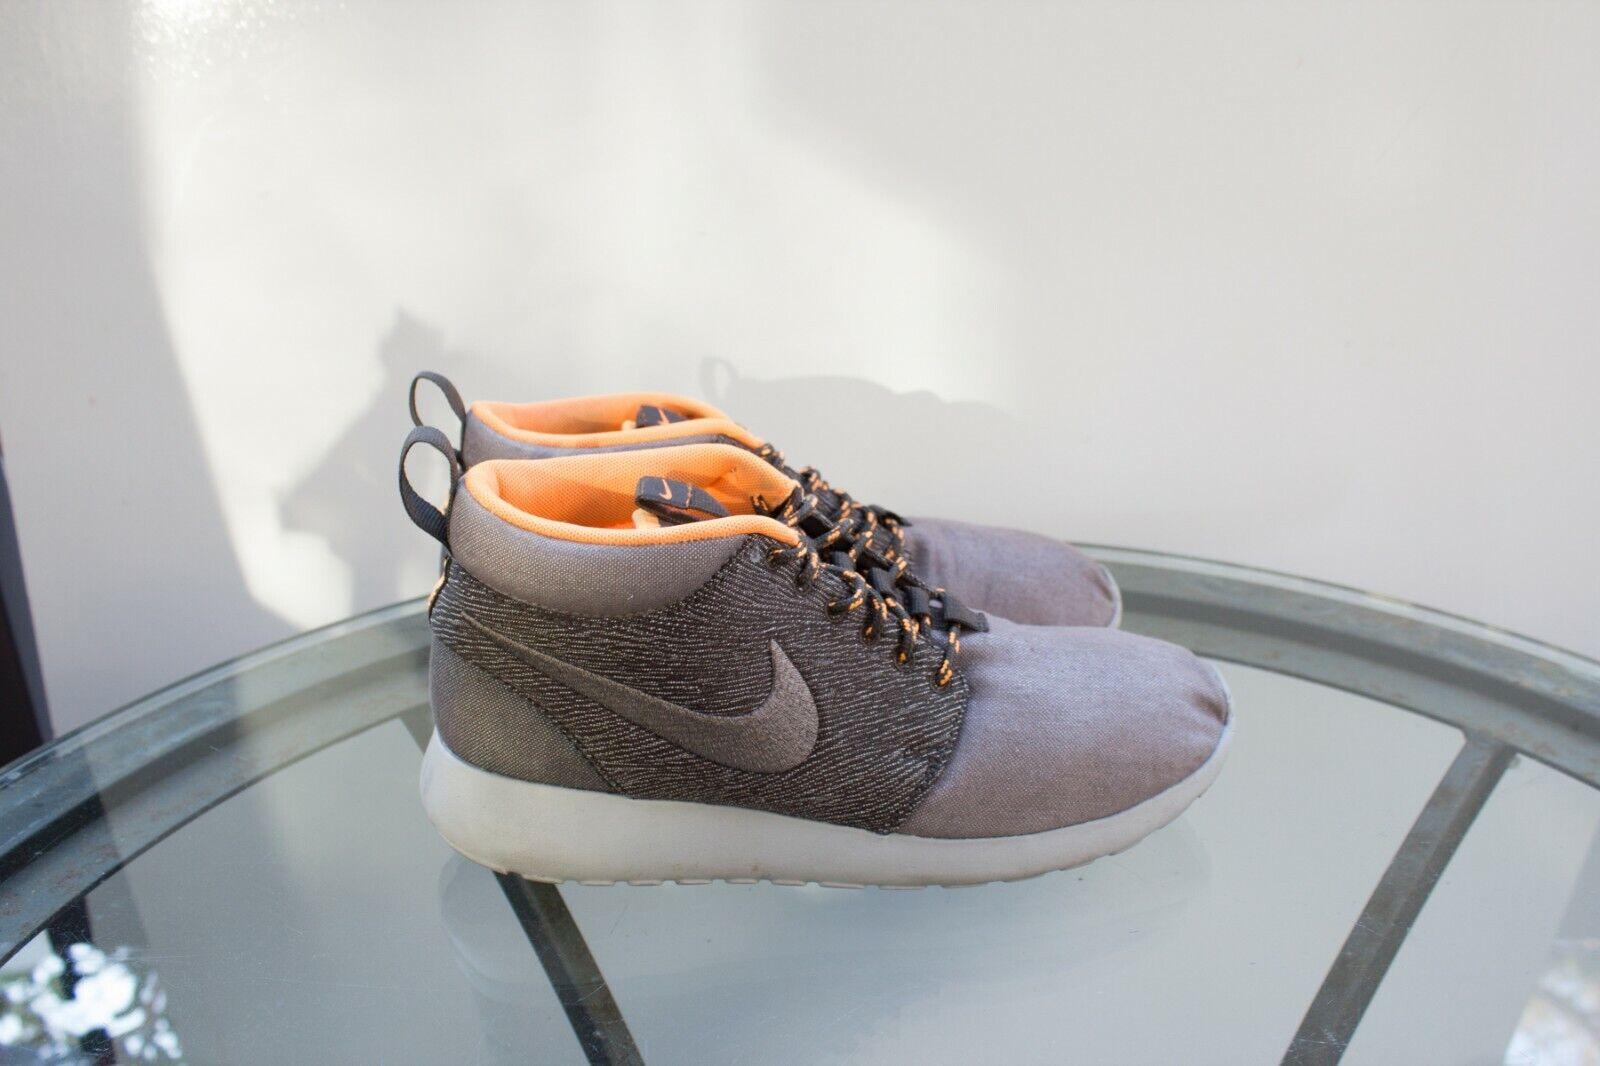 842791f72e Nike ROSHE RUN Mid SMOKE COOL GREY GRANITE 585898-222 Size 7.5 QS LONDON  ntjvgg2592-Athletic Shoes. Men's ...